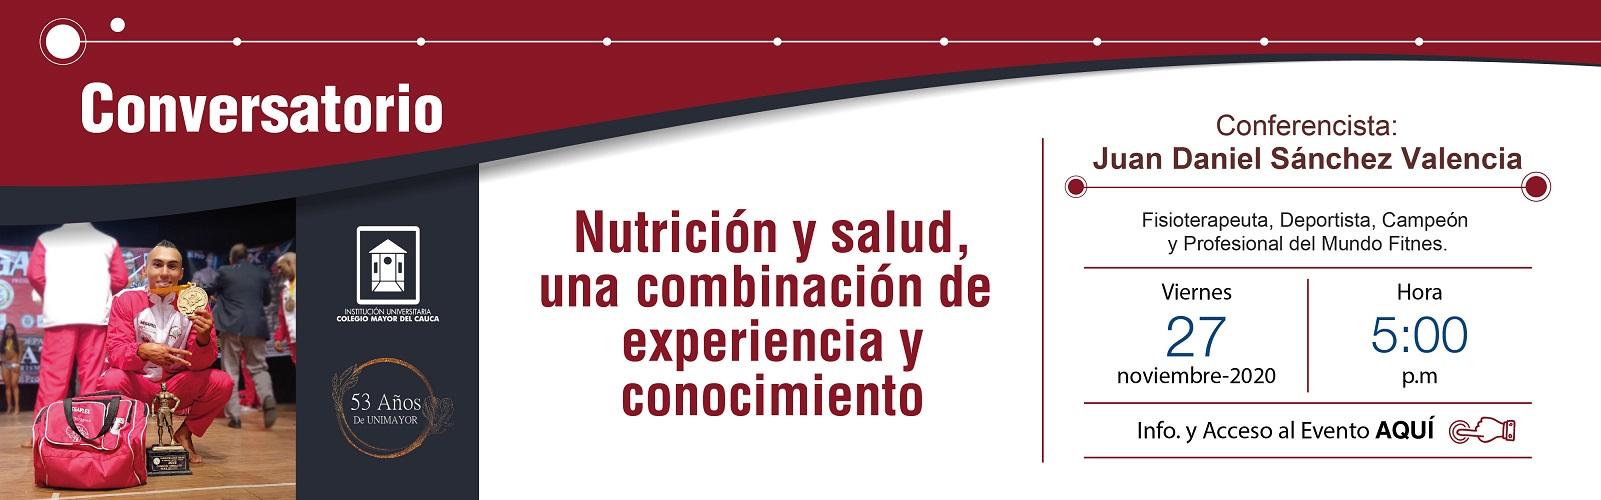 Banner_Conversatorio_Nutricin